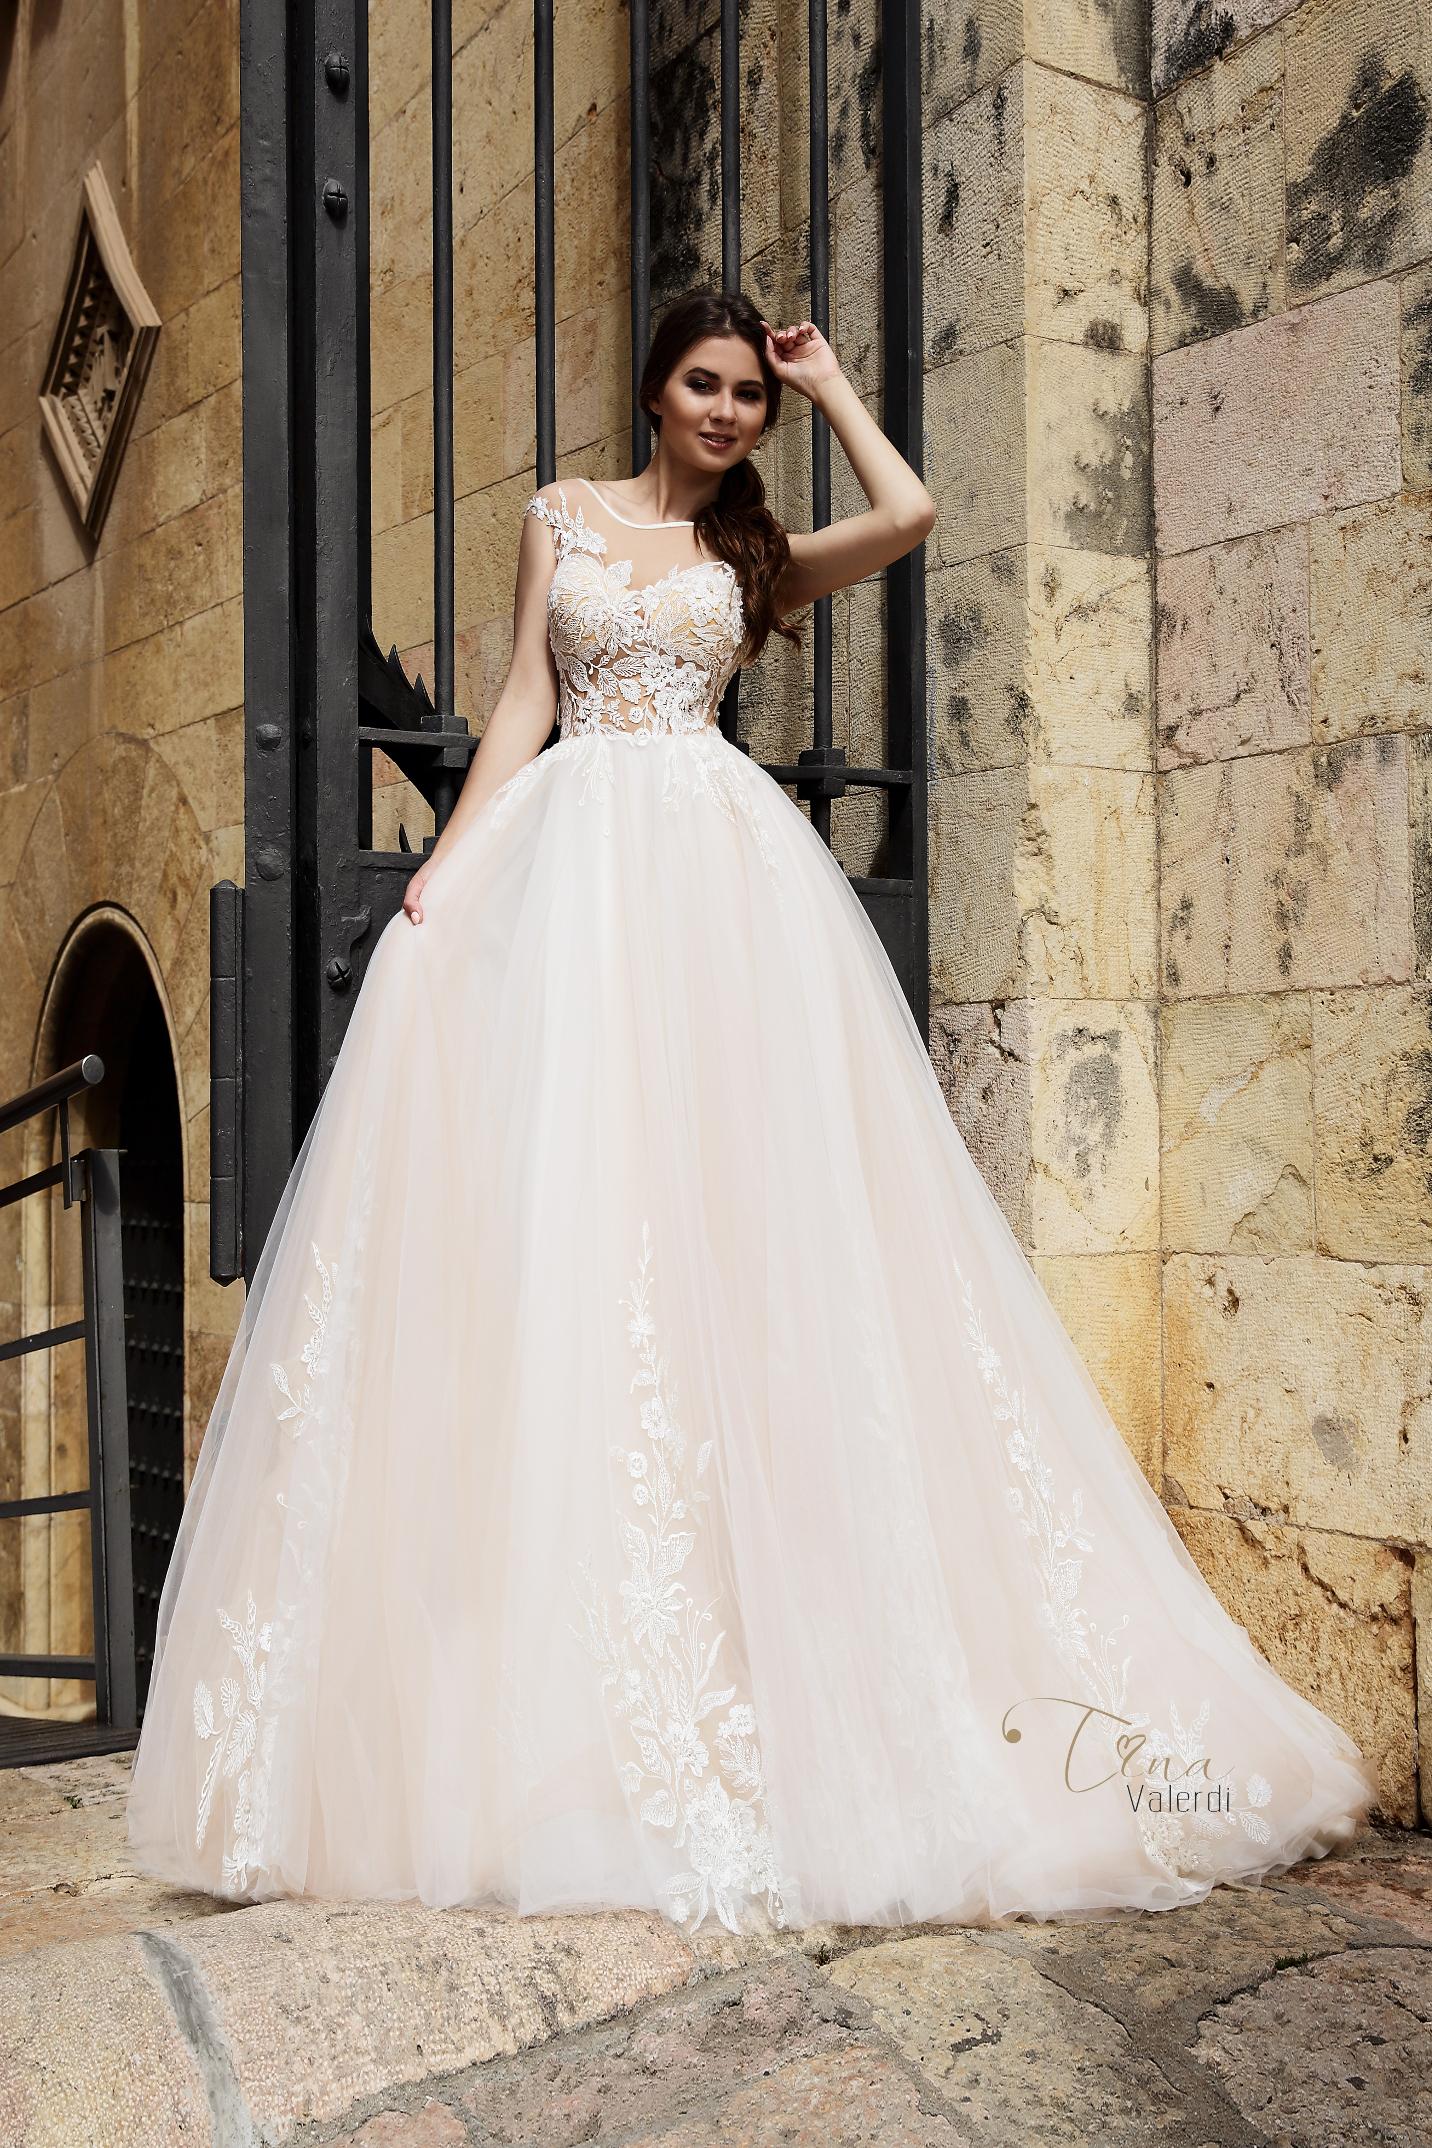 vestuvines sukneles tina valerdi Paloma1